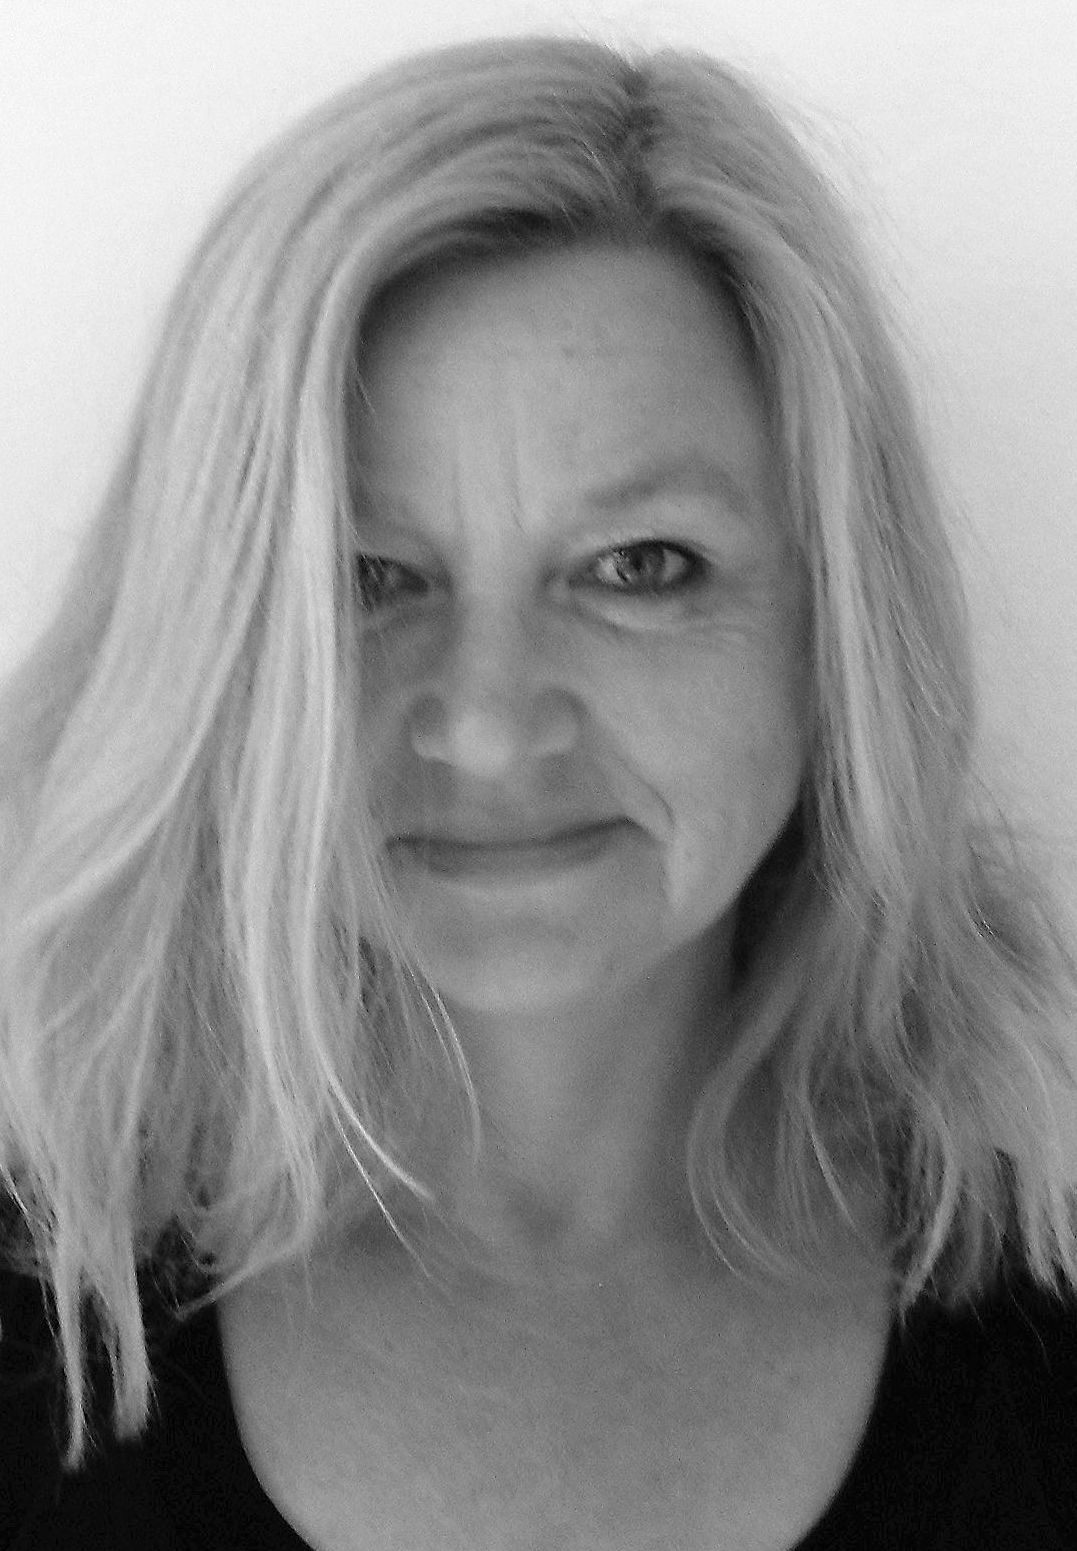 Karin Wieland Nude Photos 15